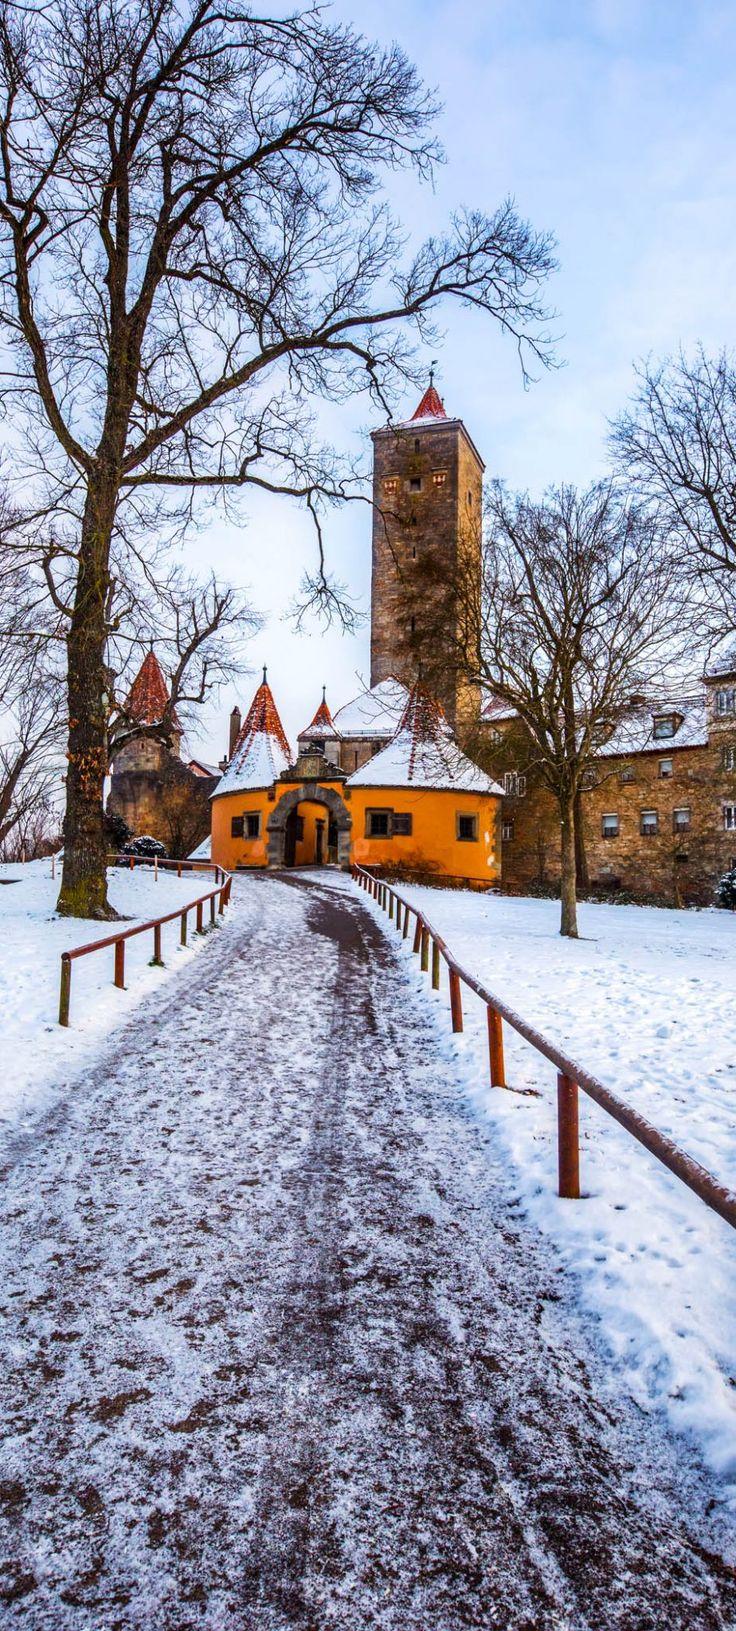 Castle Gate, Rothenburg ob der Tauber, Bavaria, Germany | The 20 Most Stunning Fairytale Castles in Winter